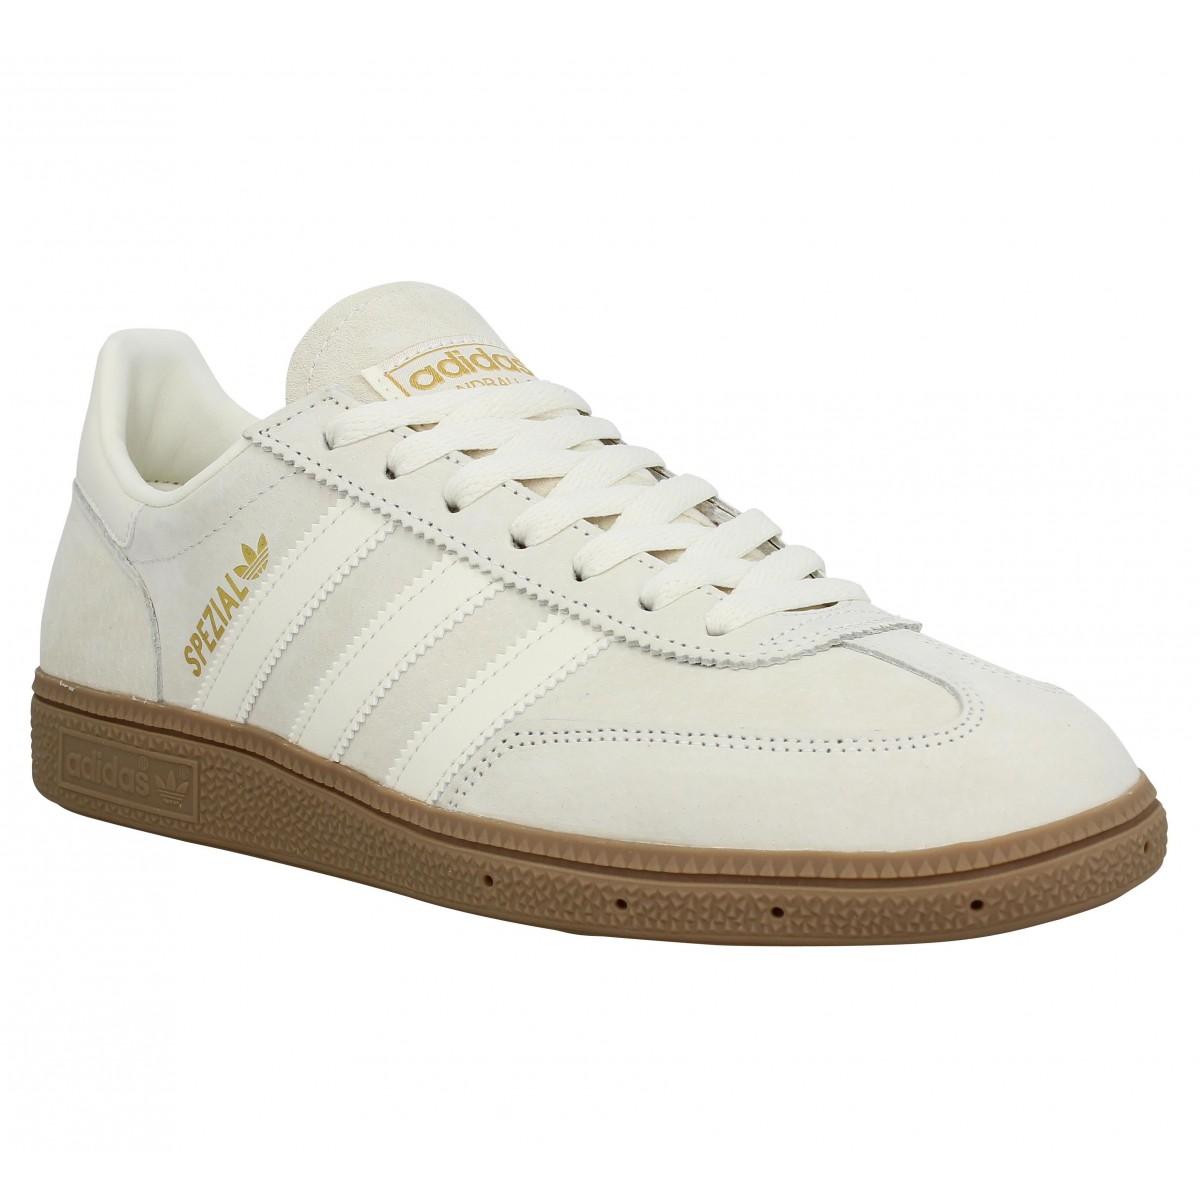 Beige Adidas Spezial Spezial Velours Adidas Velours orxBdCe